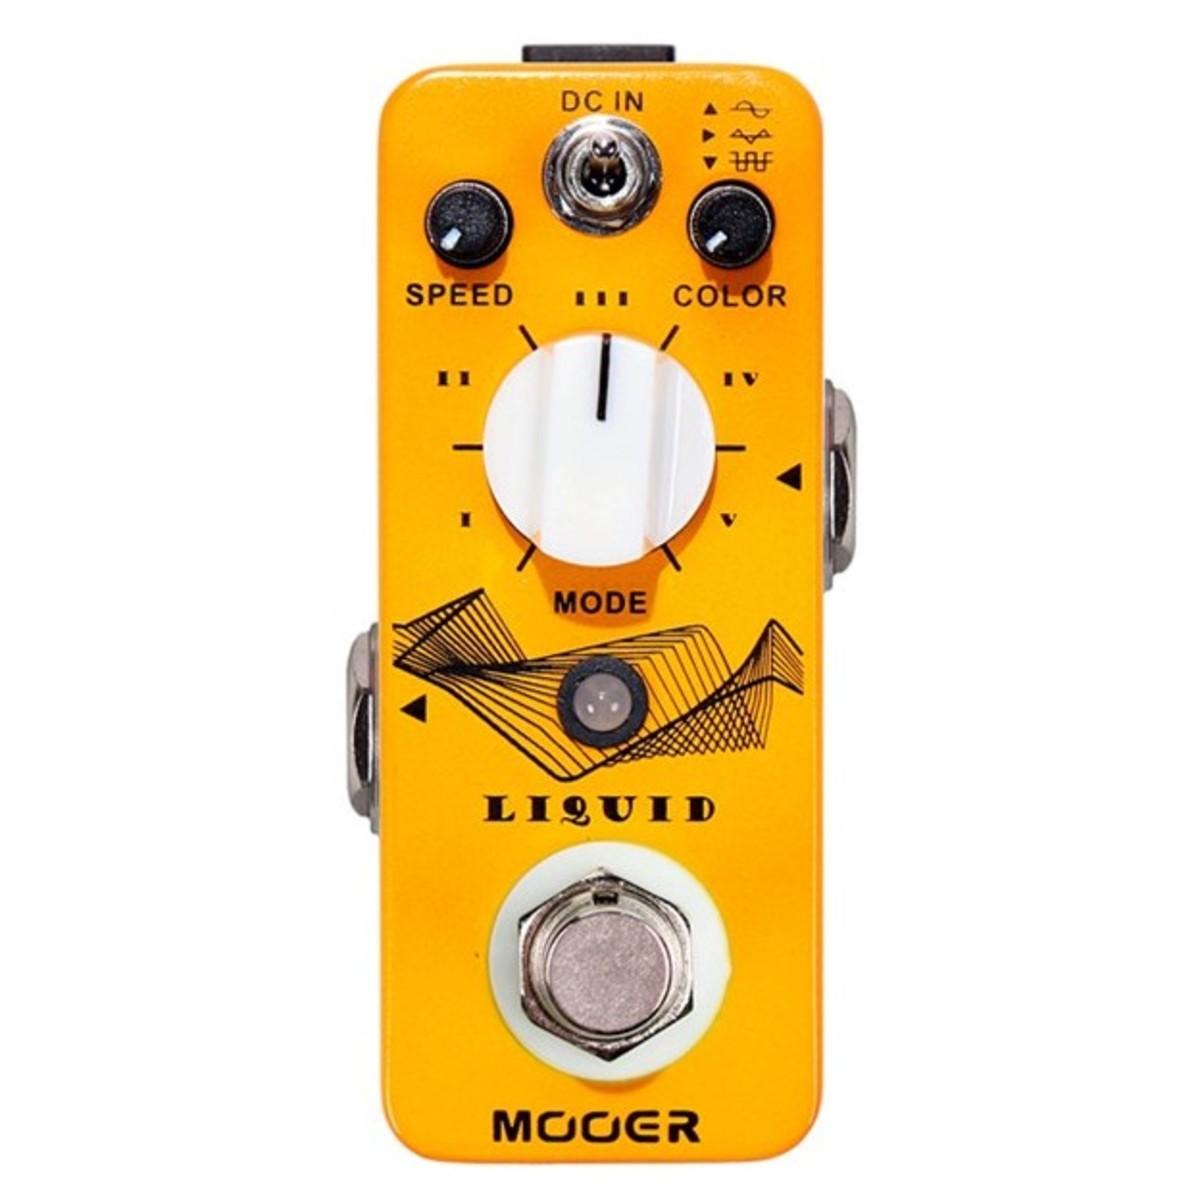 mooer mph2 liquid digital phaser pedal at gear4music. Black Bedroom Furniture Sets. Home Design Ideas